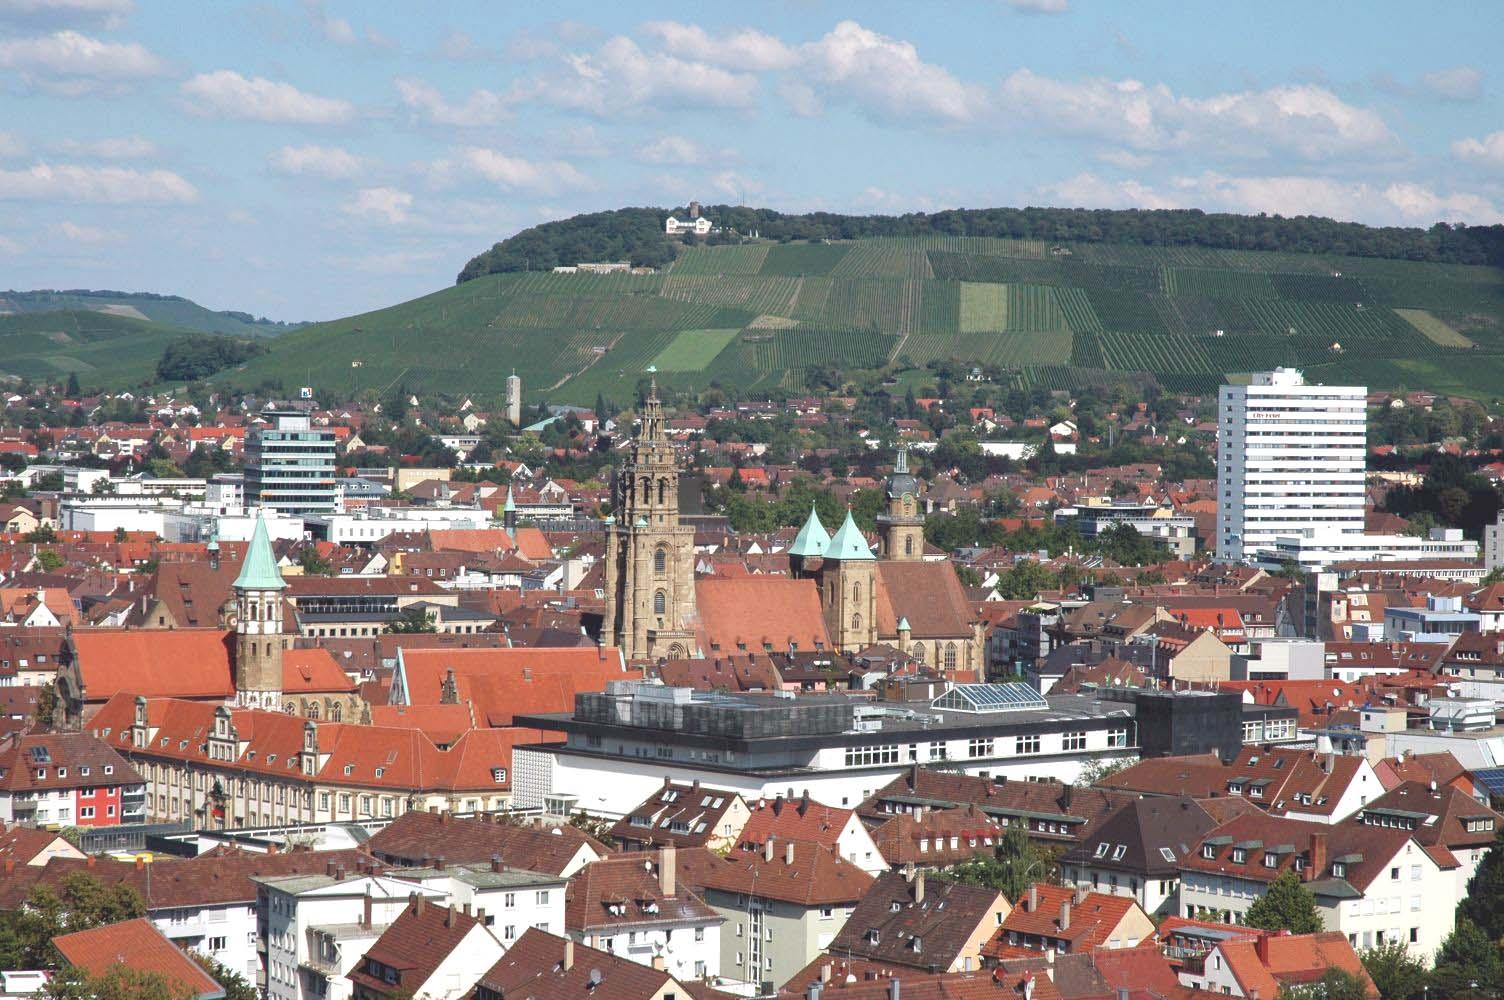 Heilbronn dating I want sexual dating in Heilbronn, 36yo Vinterny Courtesan Escort Germany